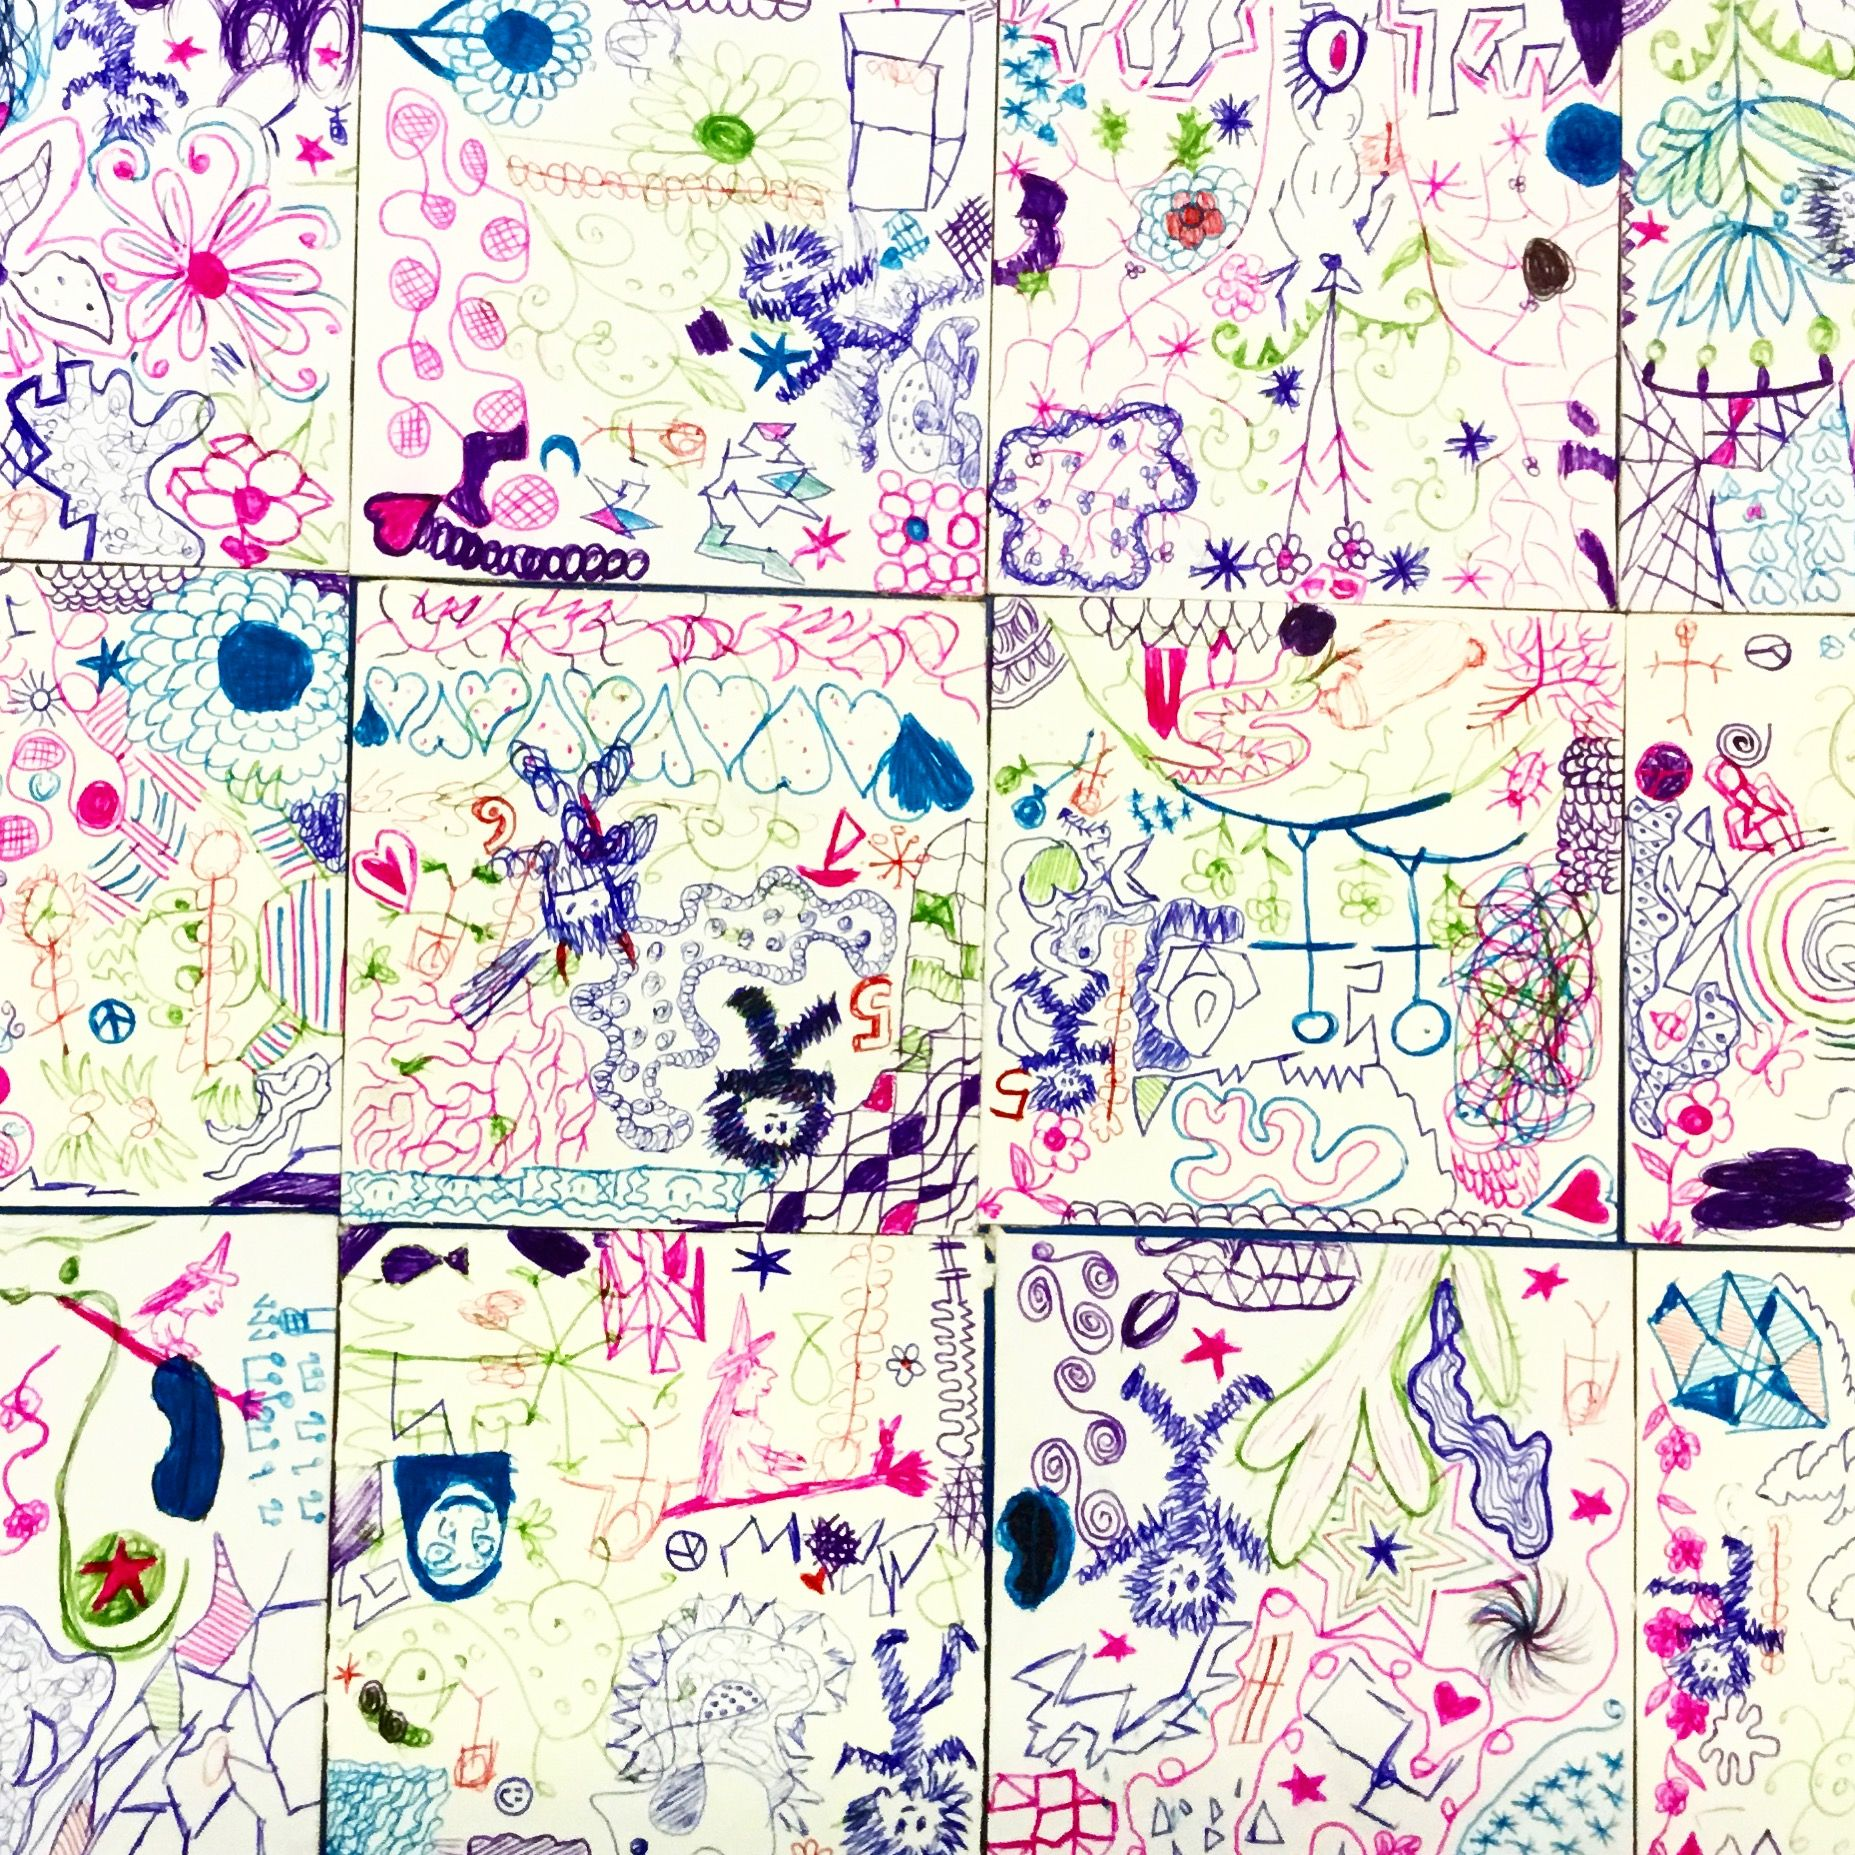 Young Carers Artwork Shared Artwork Doodles